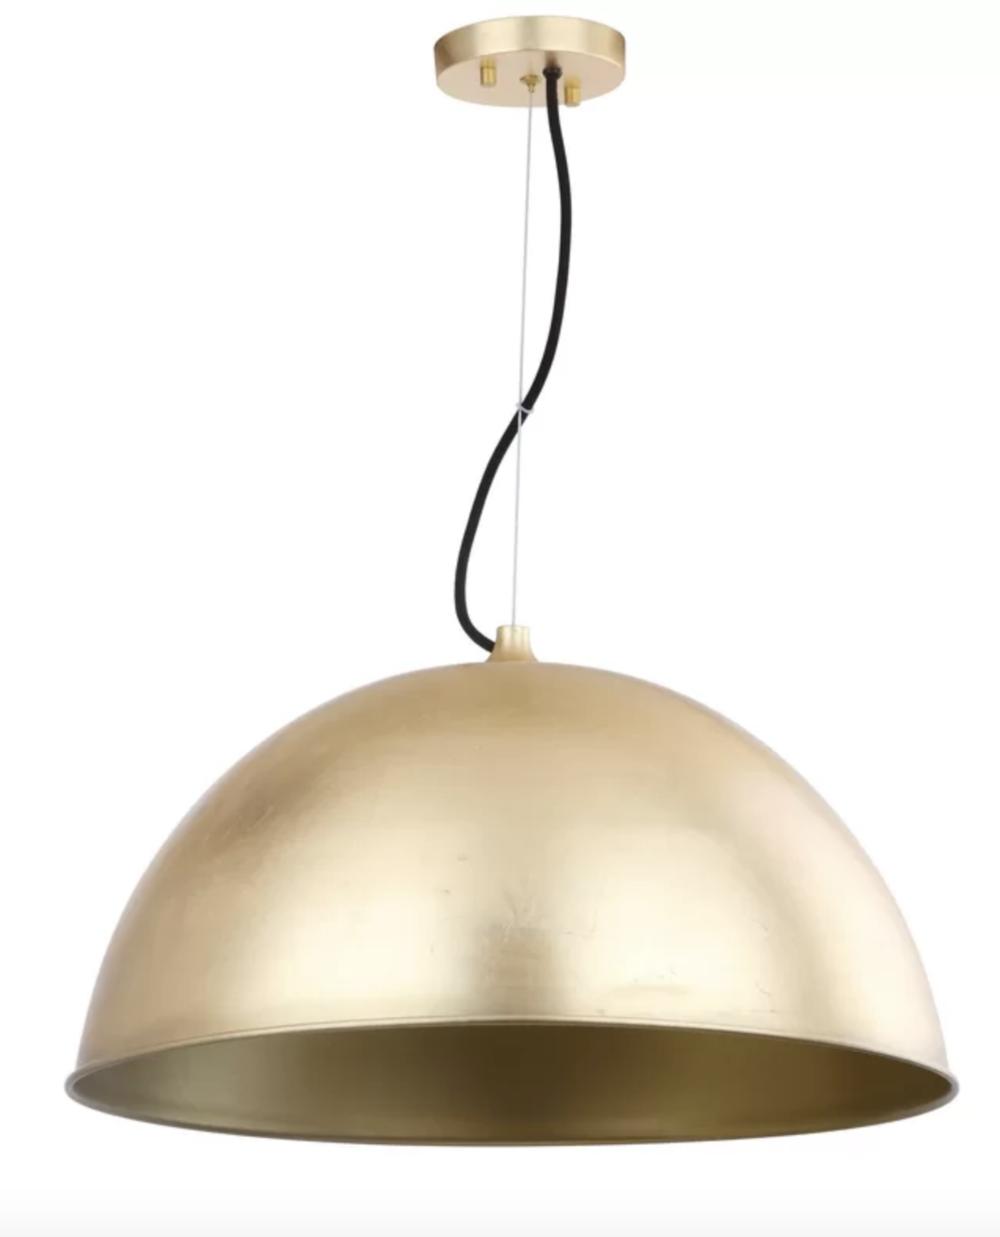 Copy of Copy of All Modern brass pendant